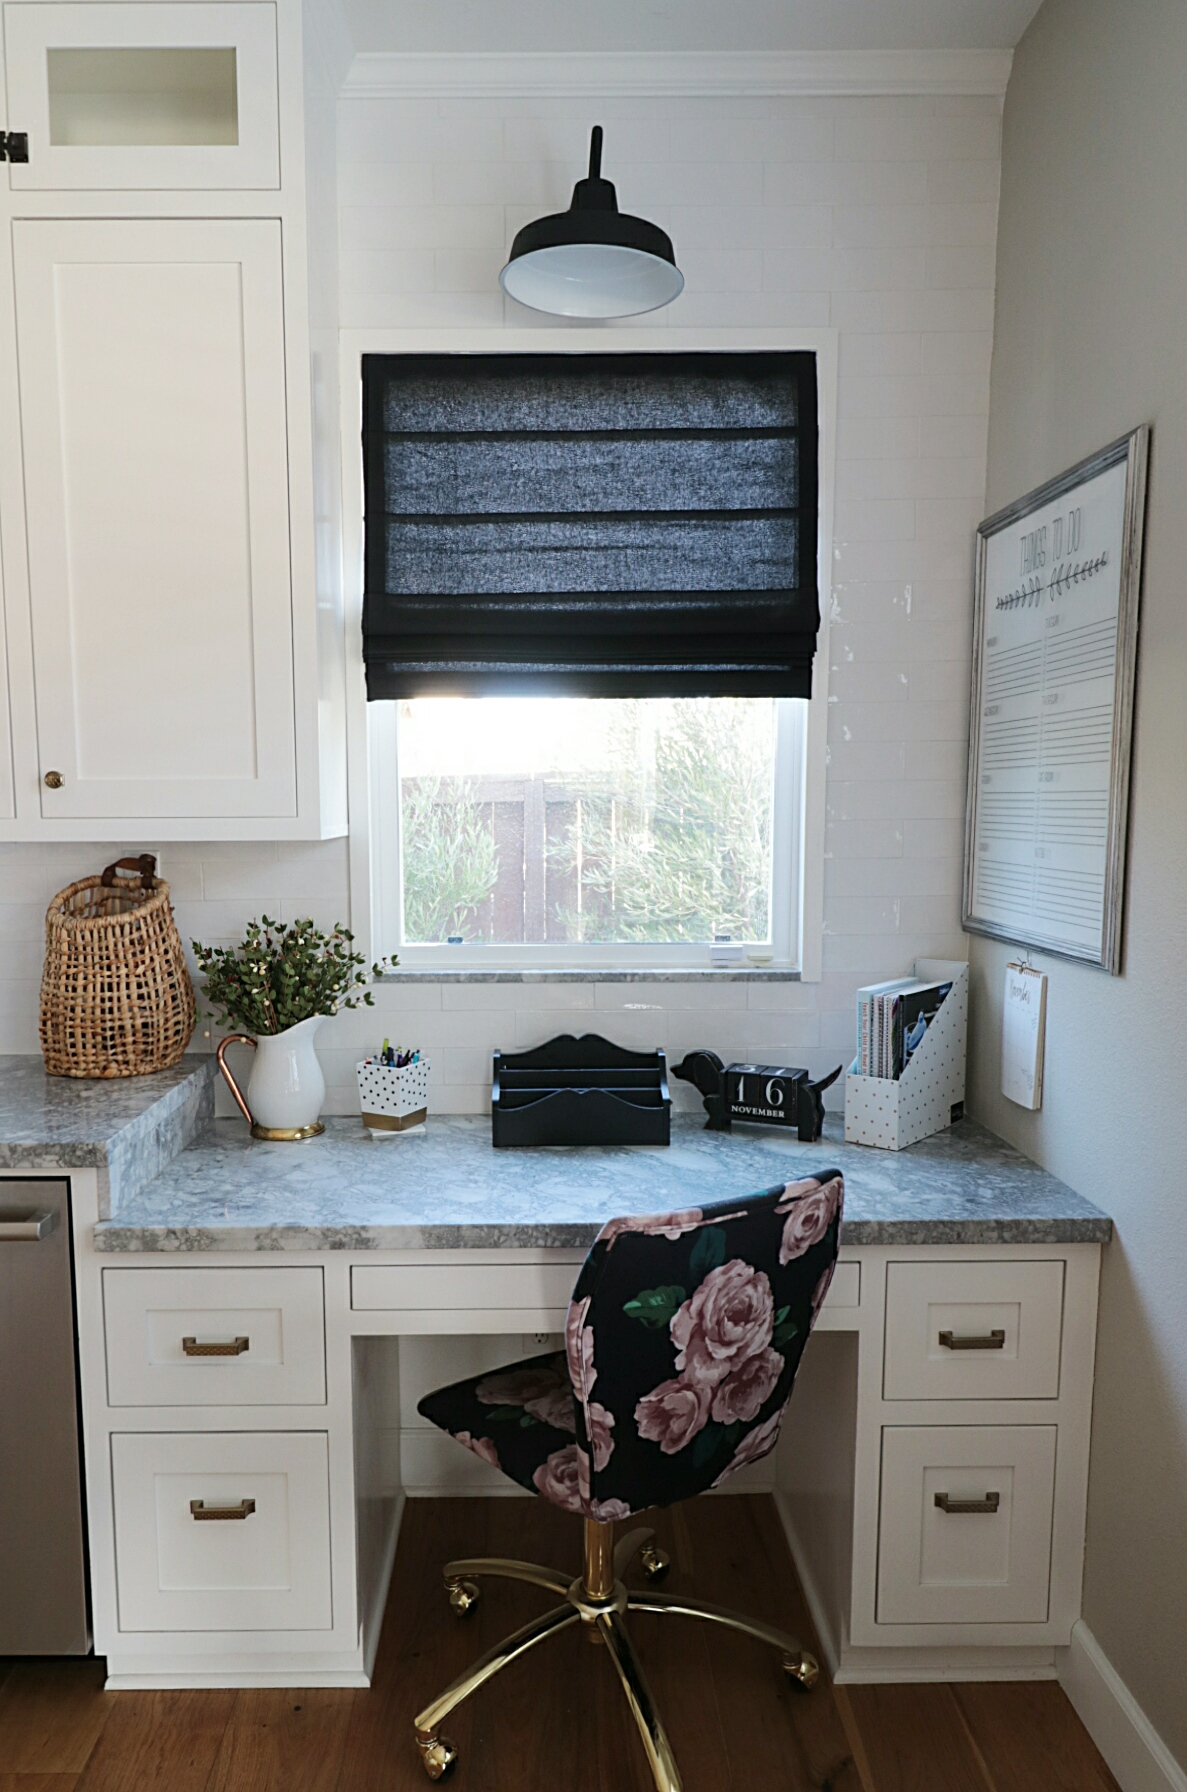 Kitchen Backsplash Installation With Floor Decor House Becomes